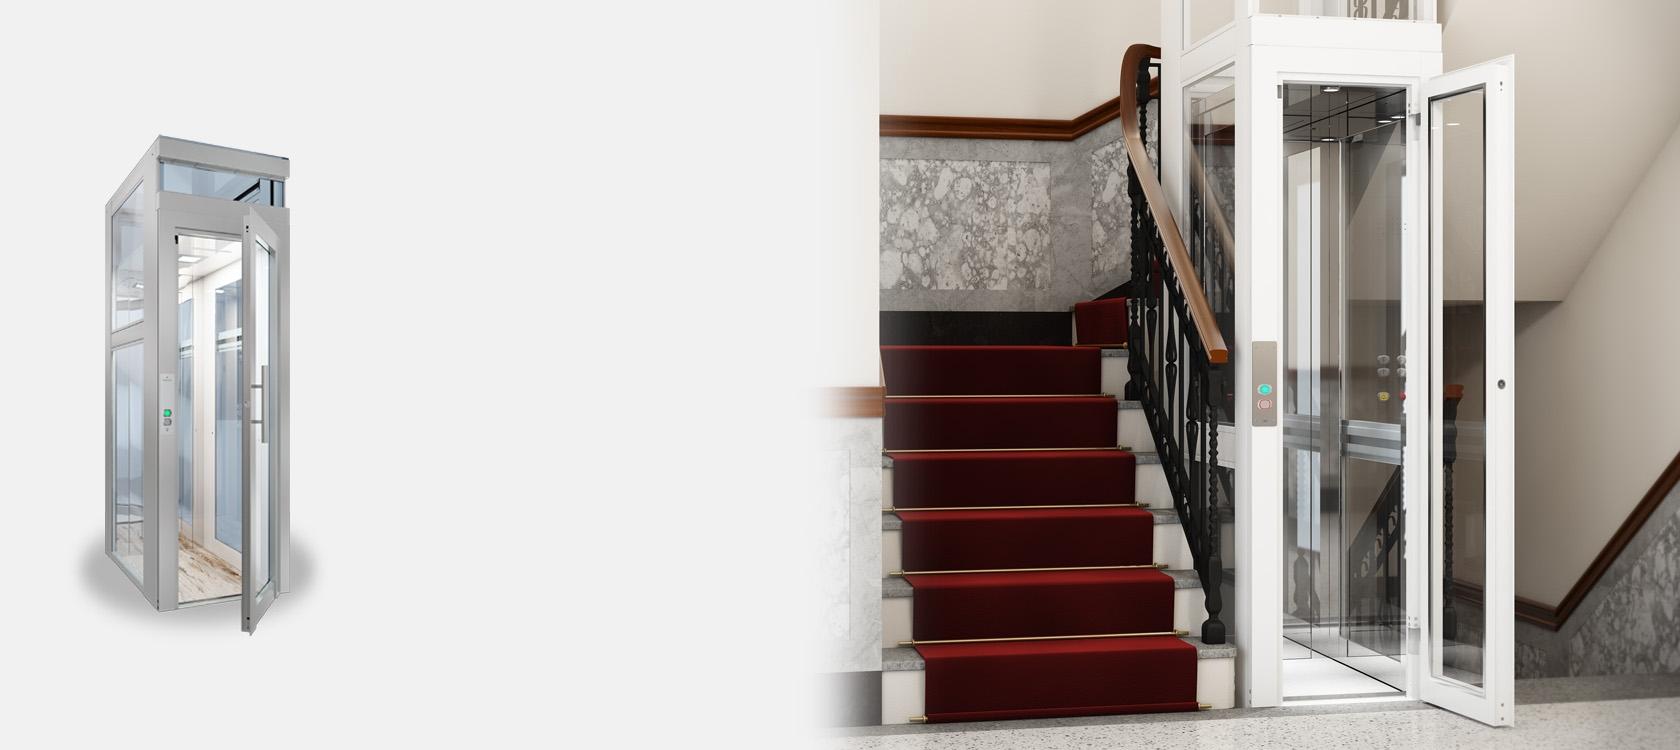 Home lifts domestic lifts and residential lifts domuslift - Ascensori da esterno prezzi ...